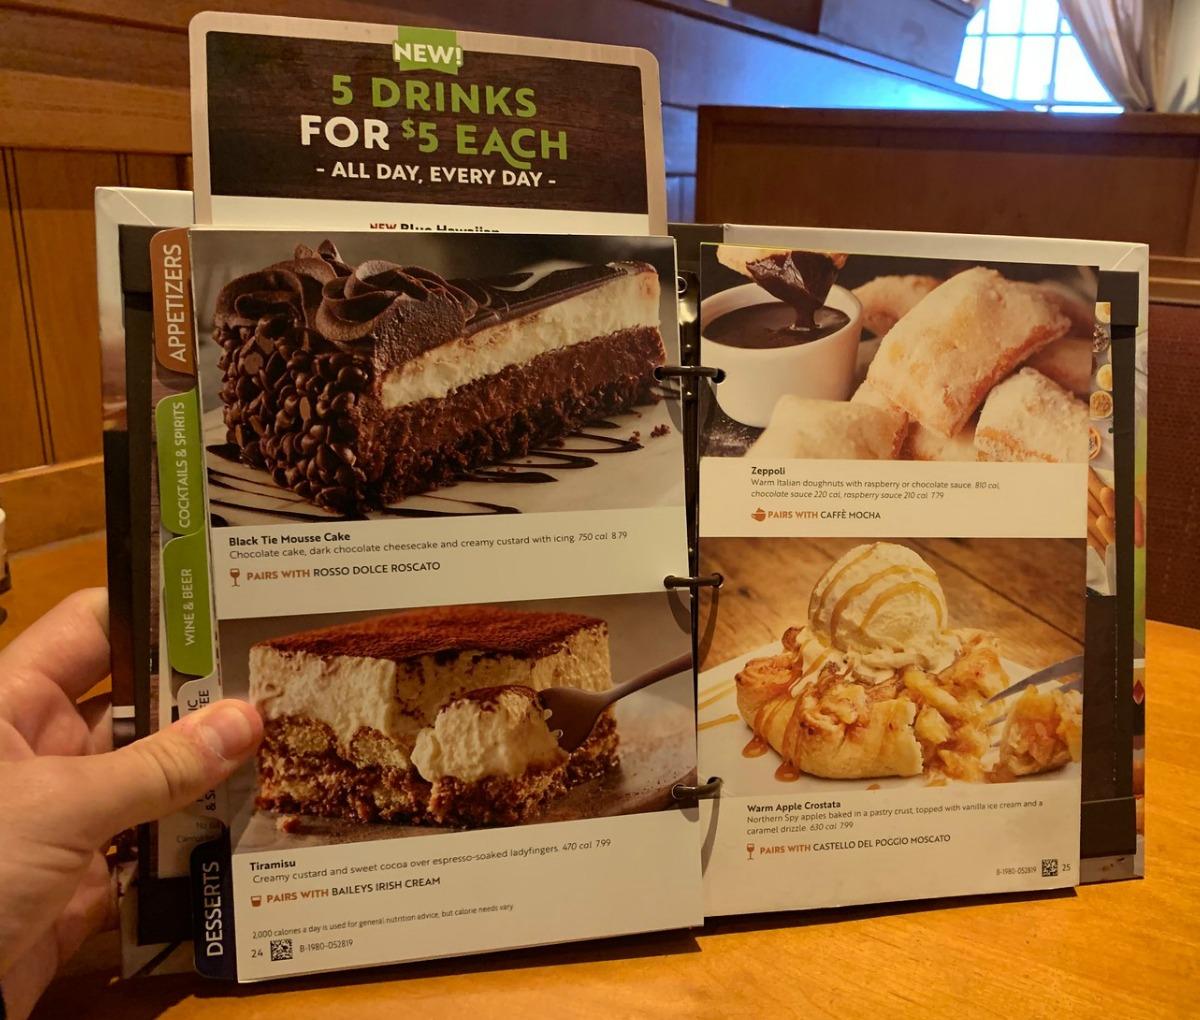 Dessert Menu at Olive Garden in restaurant at table